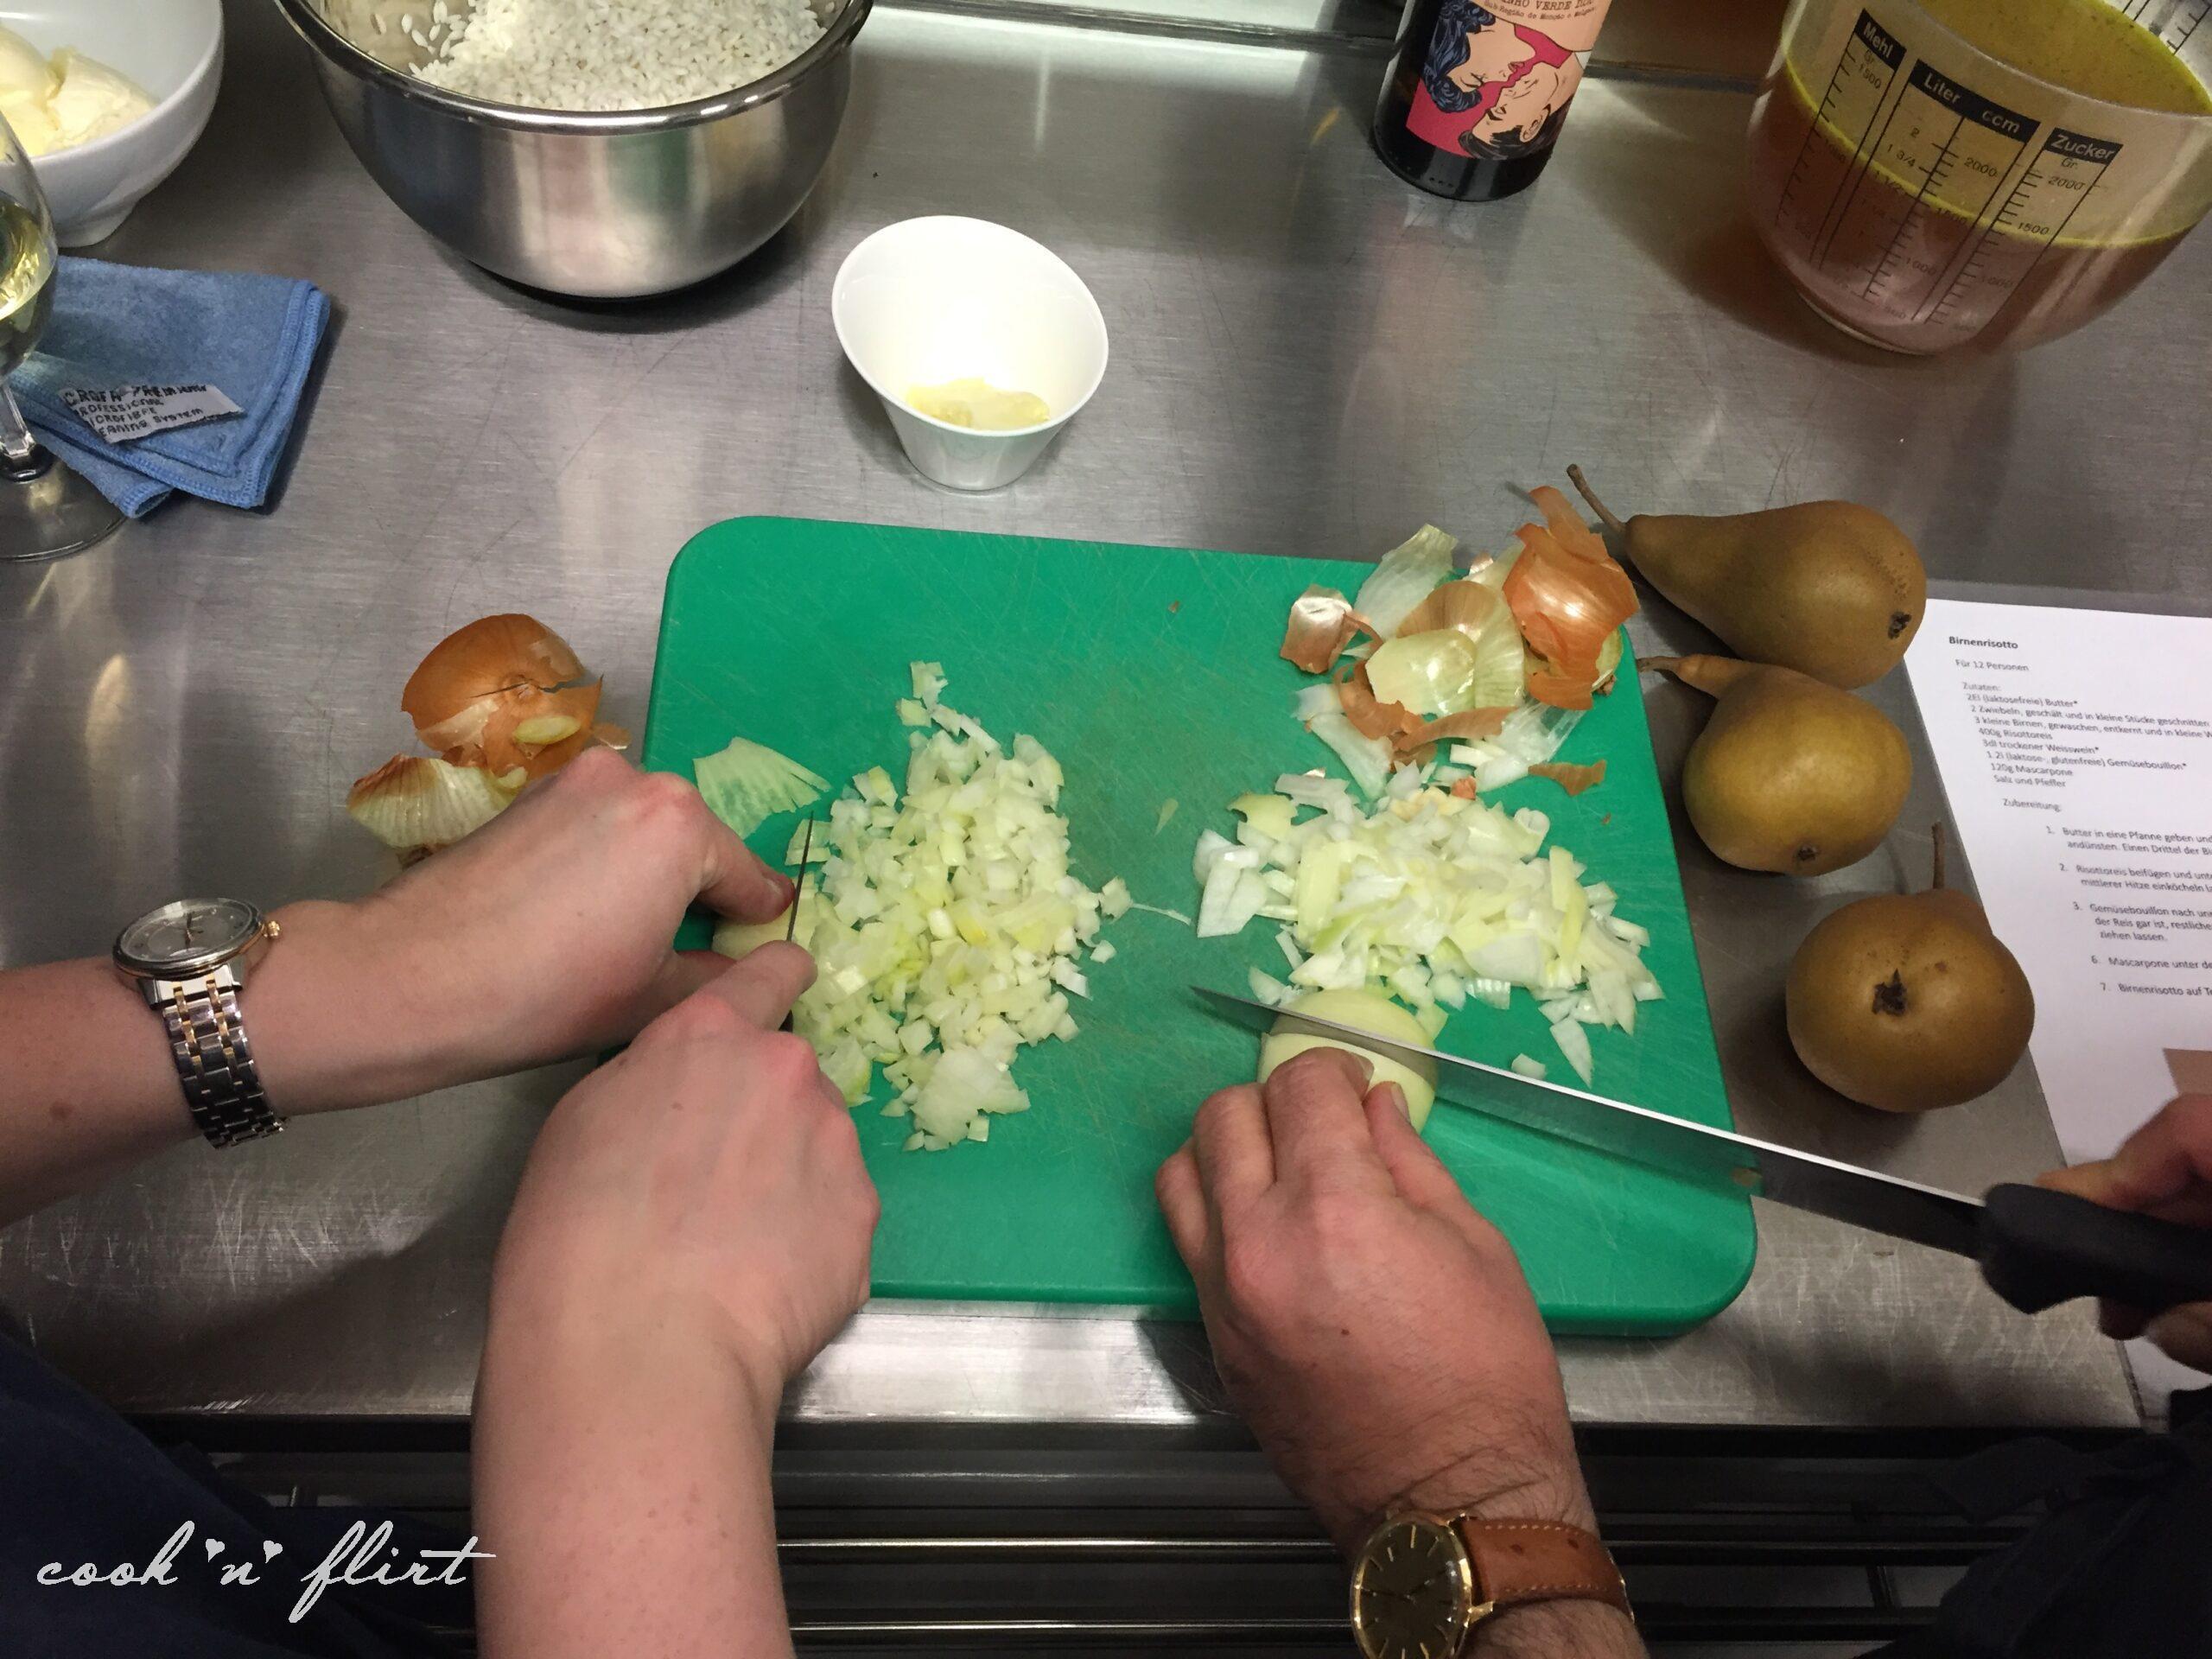 Cook 'n' Flirt am Gemüse rüsten